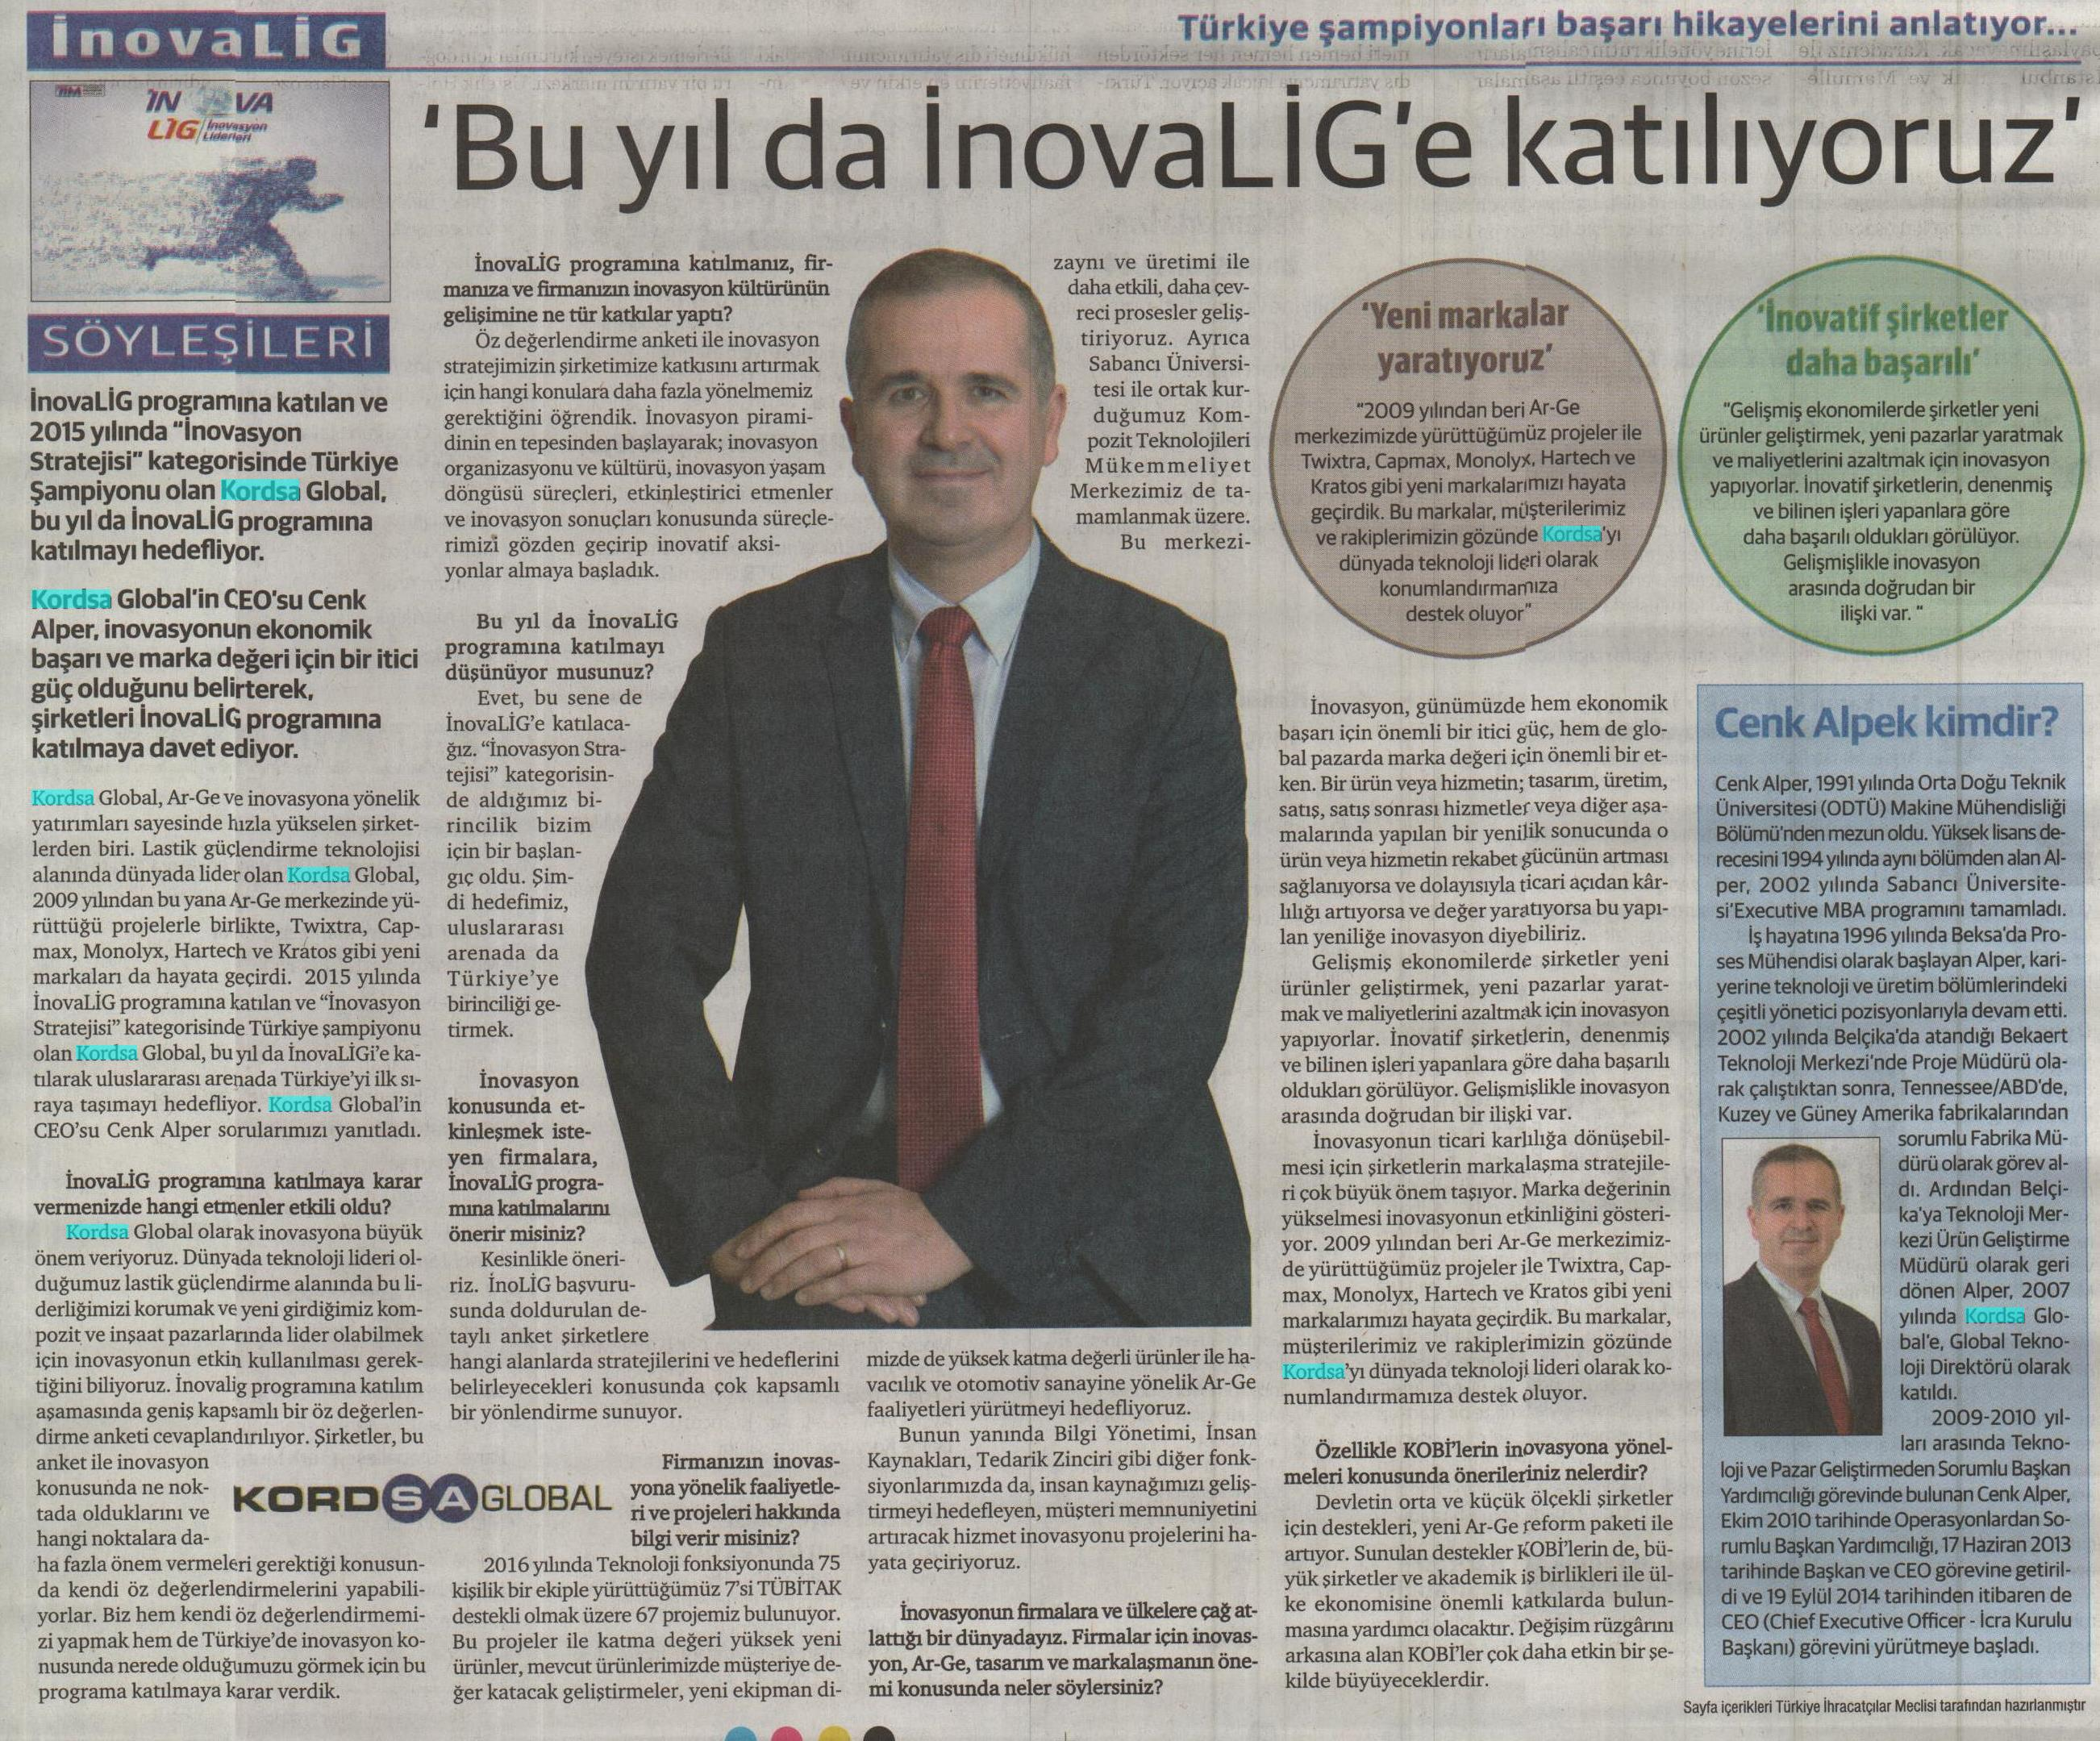 InovaLig Cenk Alper Röportajı